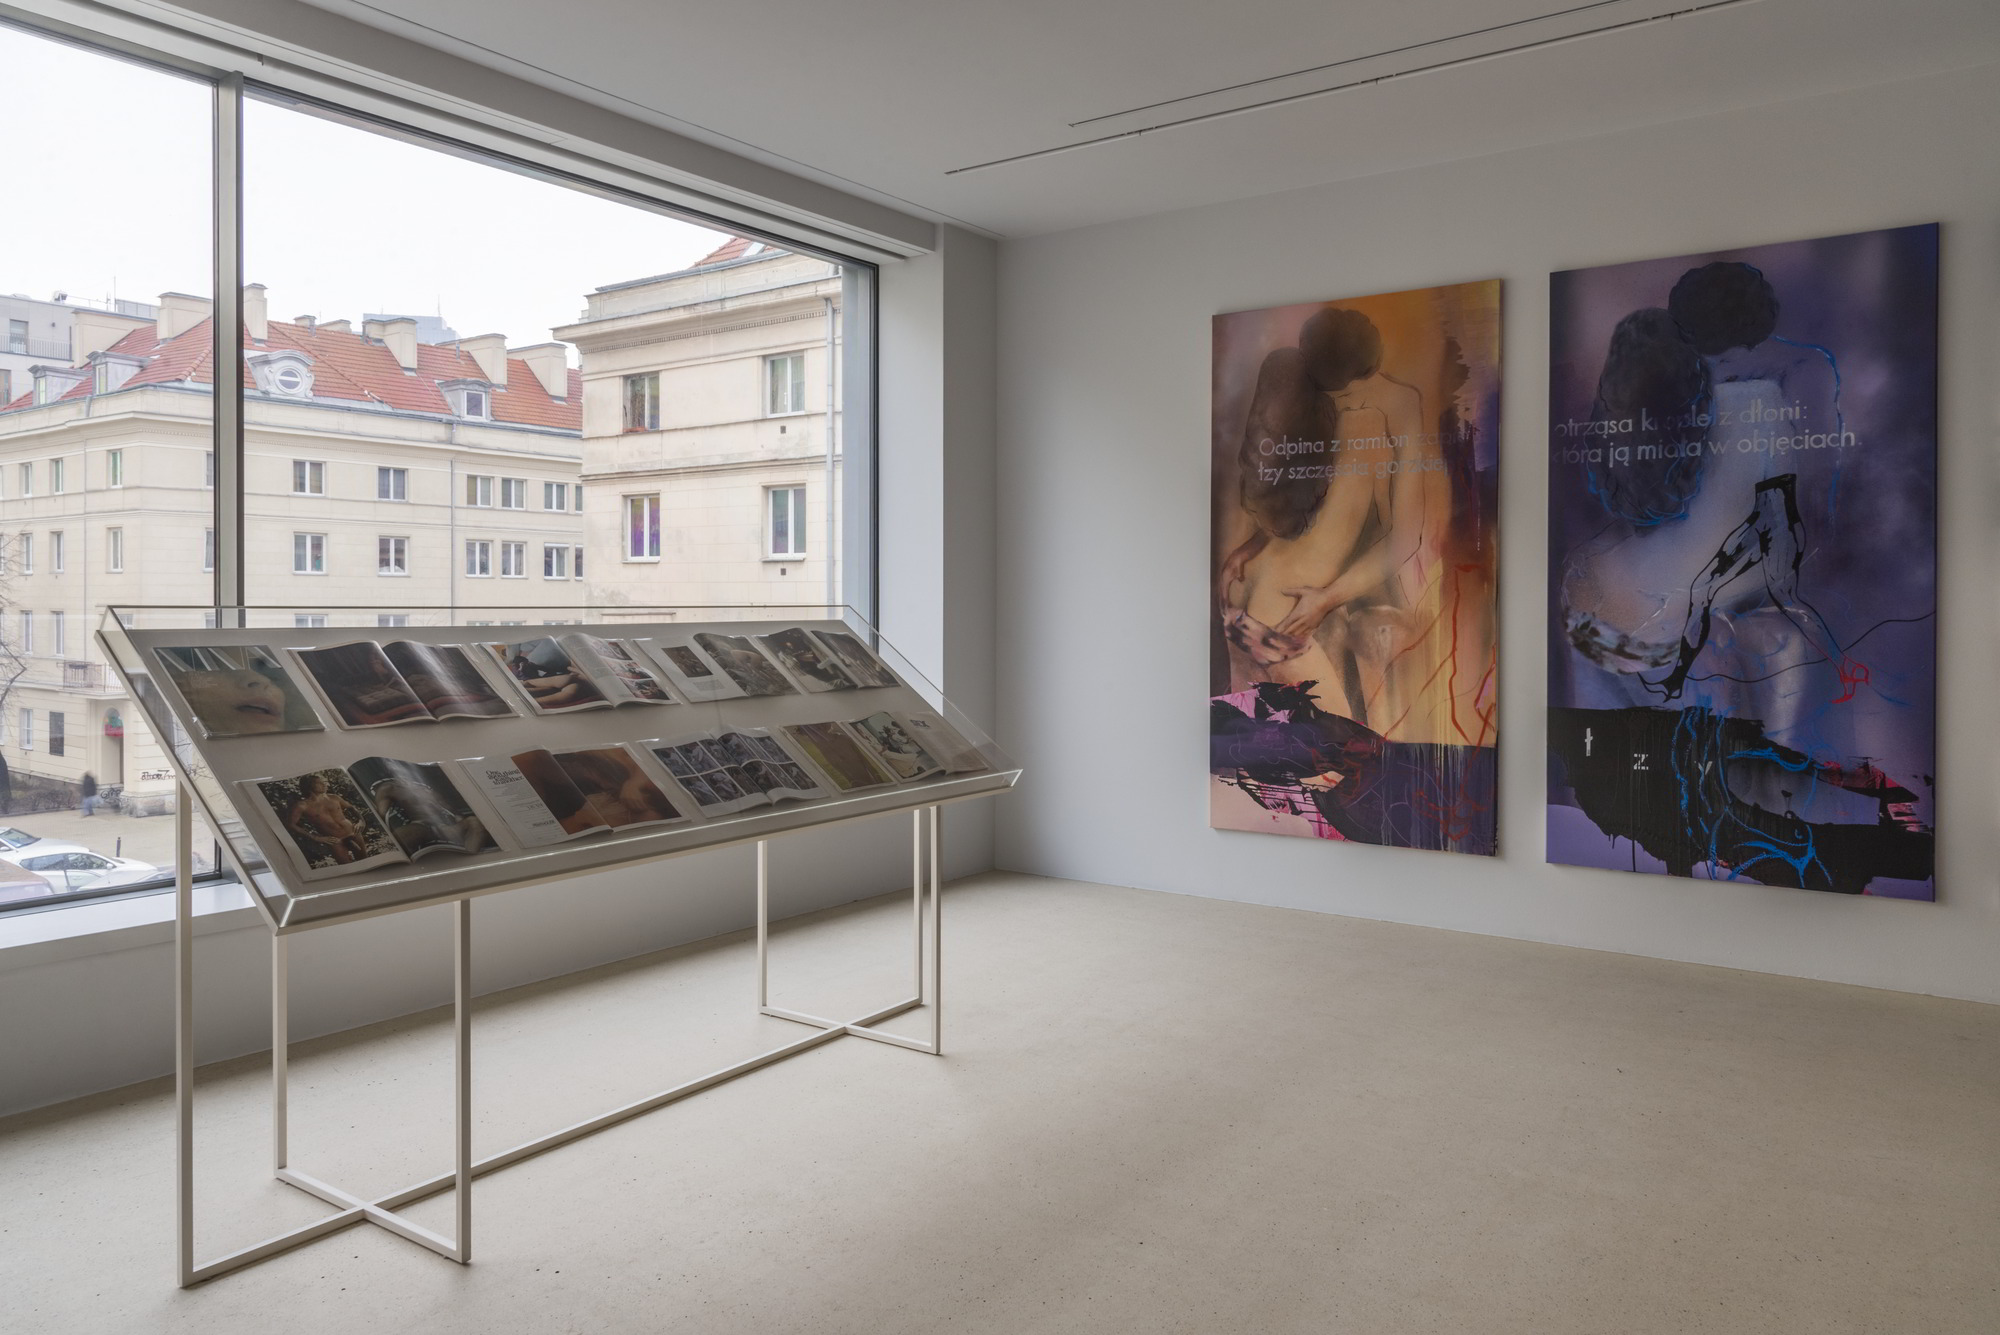 female-erotic-art-gallery-black-cock-boy-ass-free